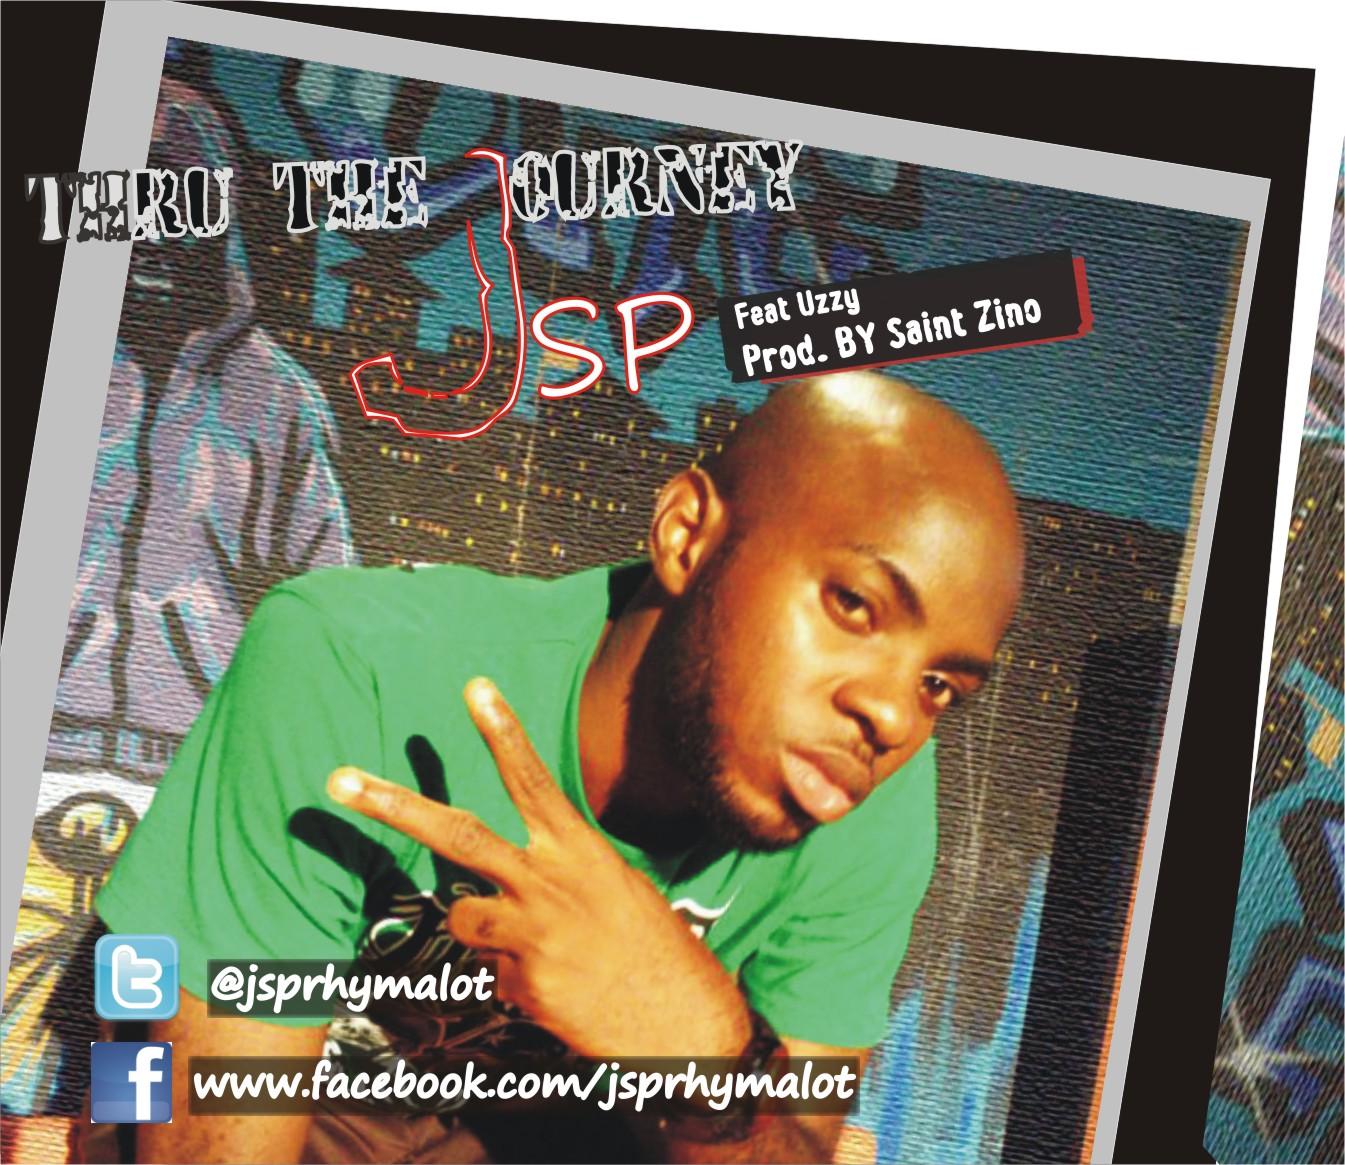 JSP ft. Uzzy - THRU THE JOURNEY [prod. Saint Zino] Artwork | AceWorldTeam.com